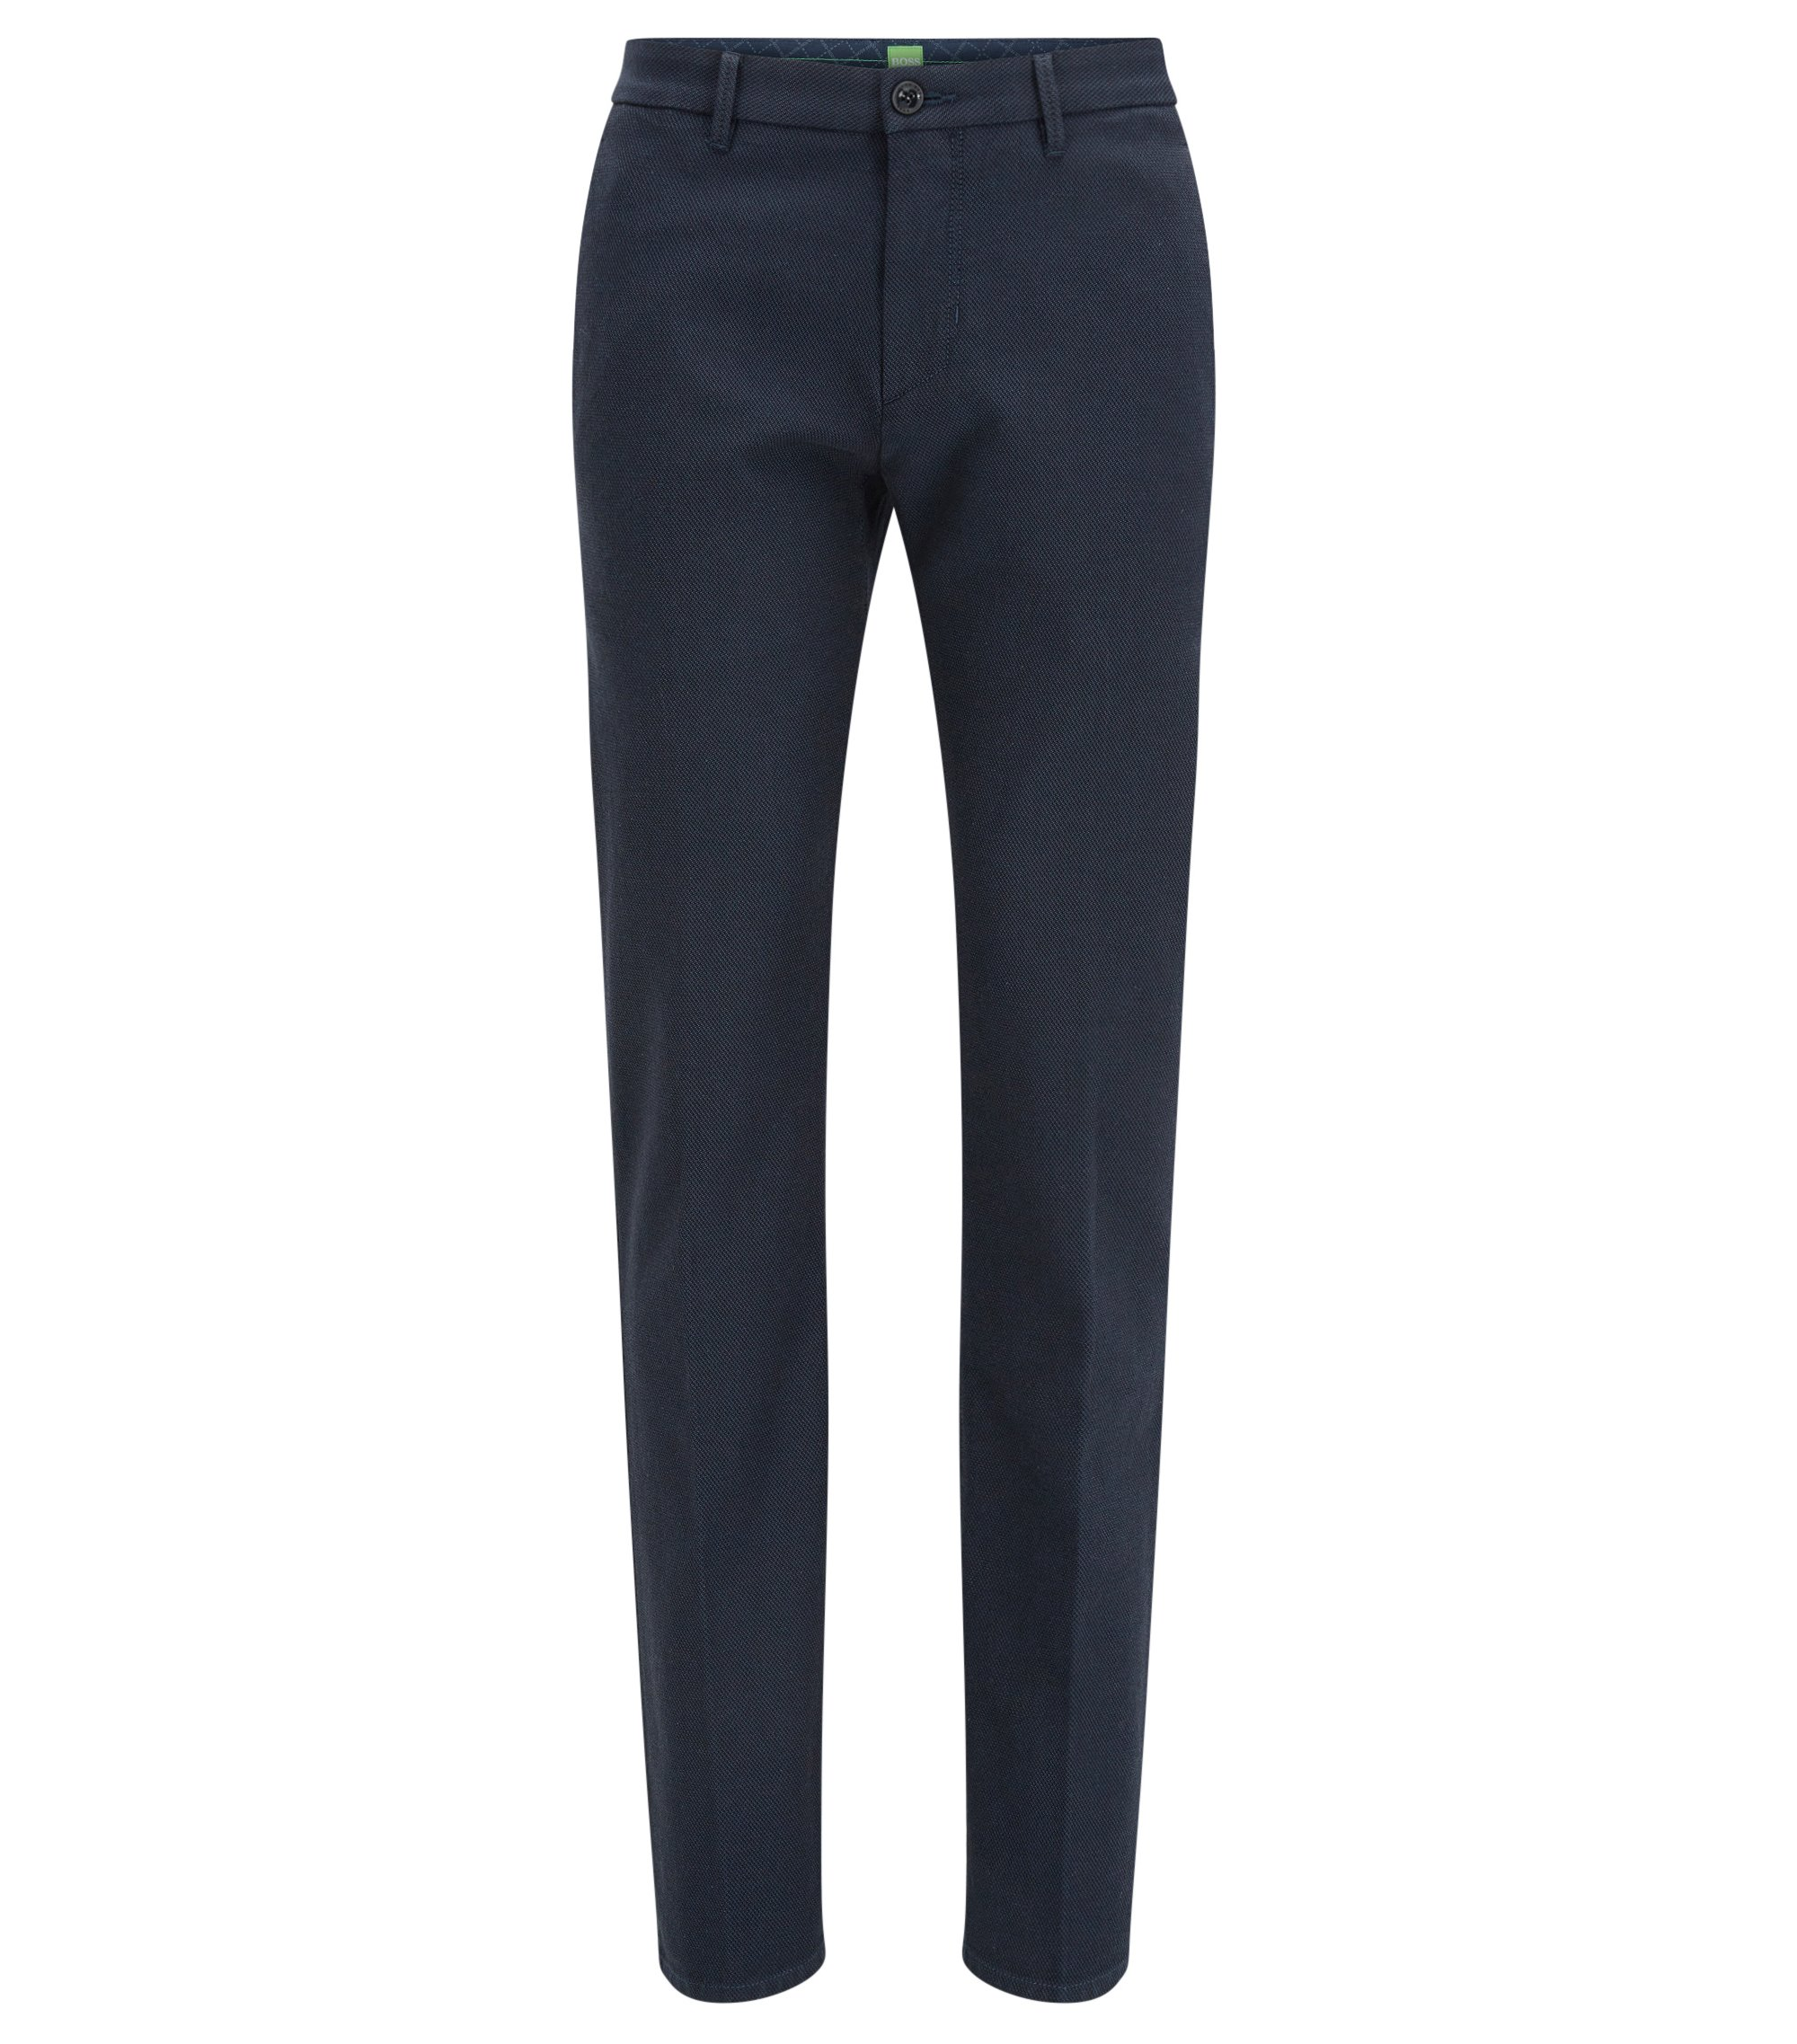 Slim-Fit Hose aus Stretch-Baumwolle, Dunkelblau